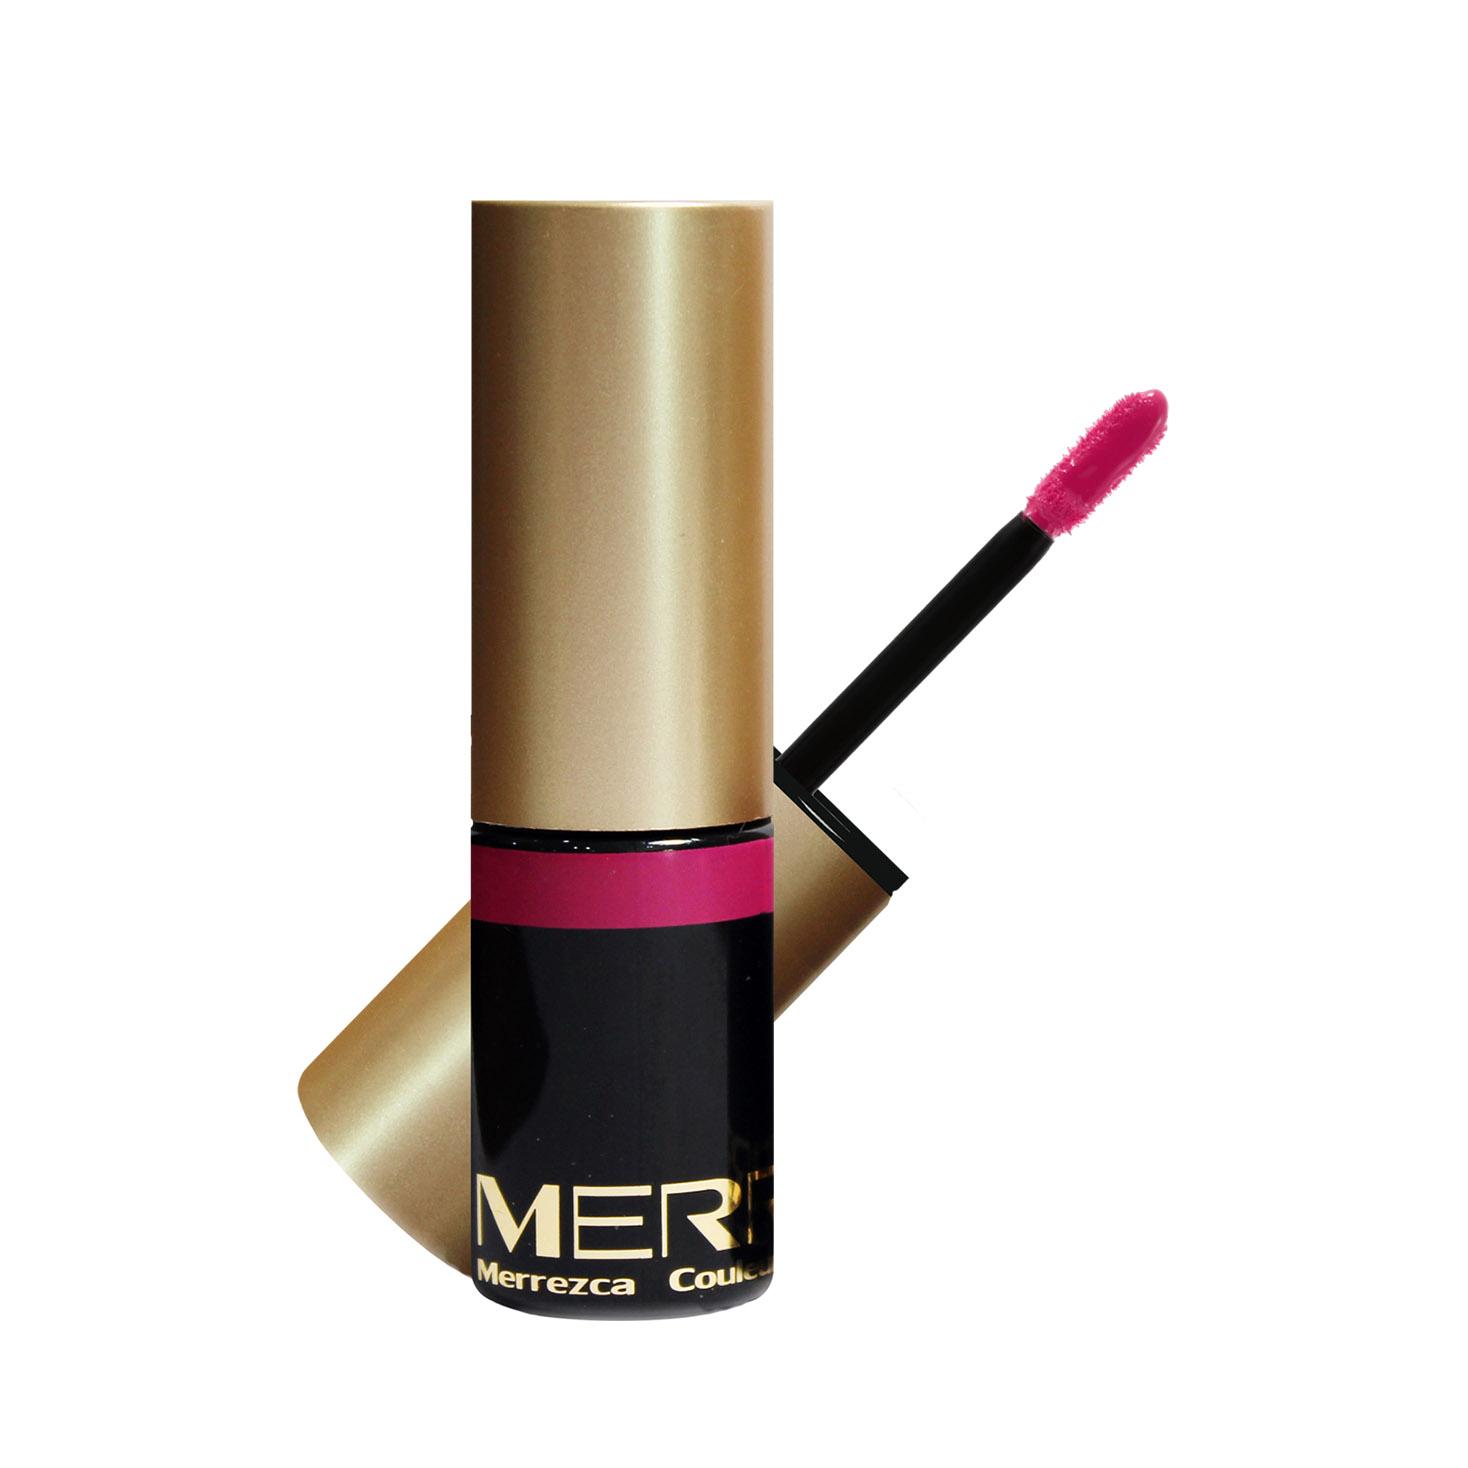 Merrez'Ca Couleur de lonue duree tints #Sexy Pink